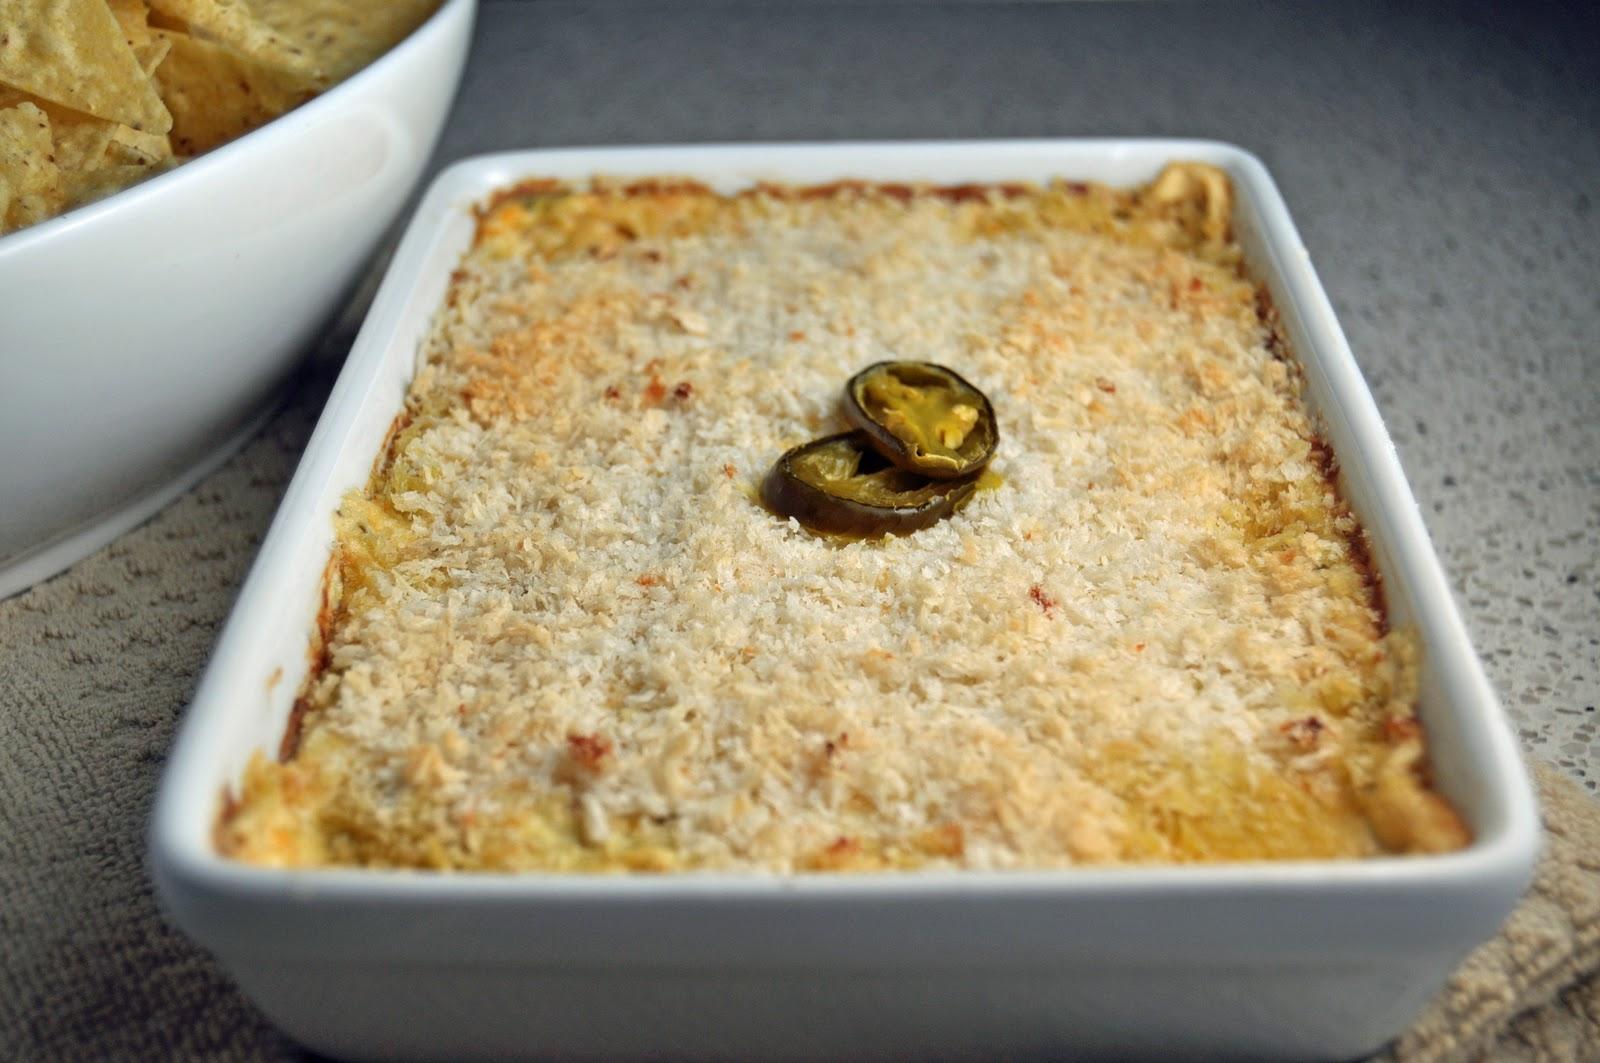 Impeccable Taste: Jalapeno Popper Dip